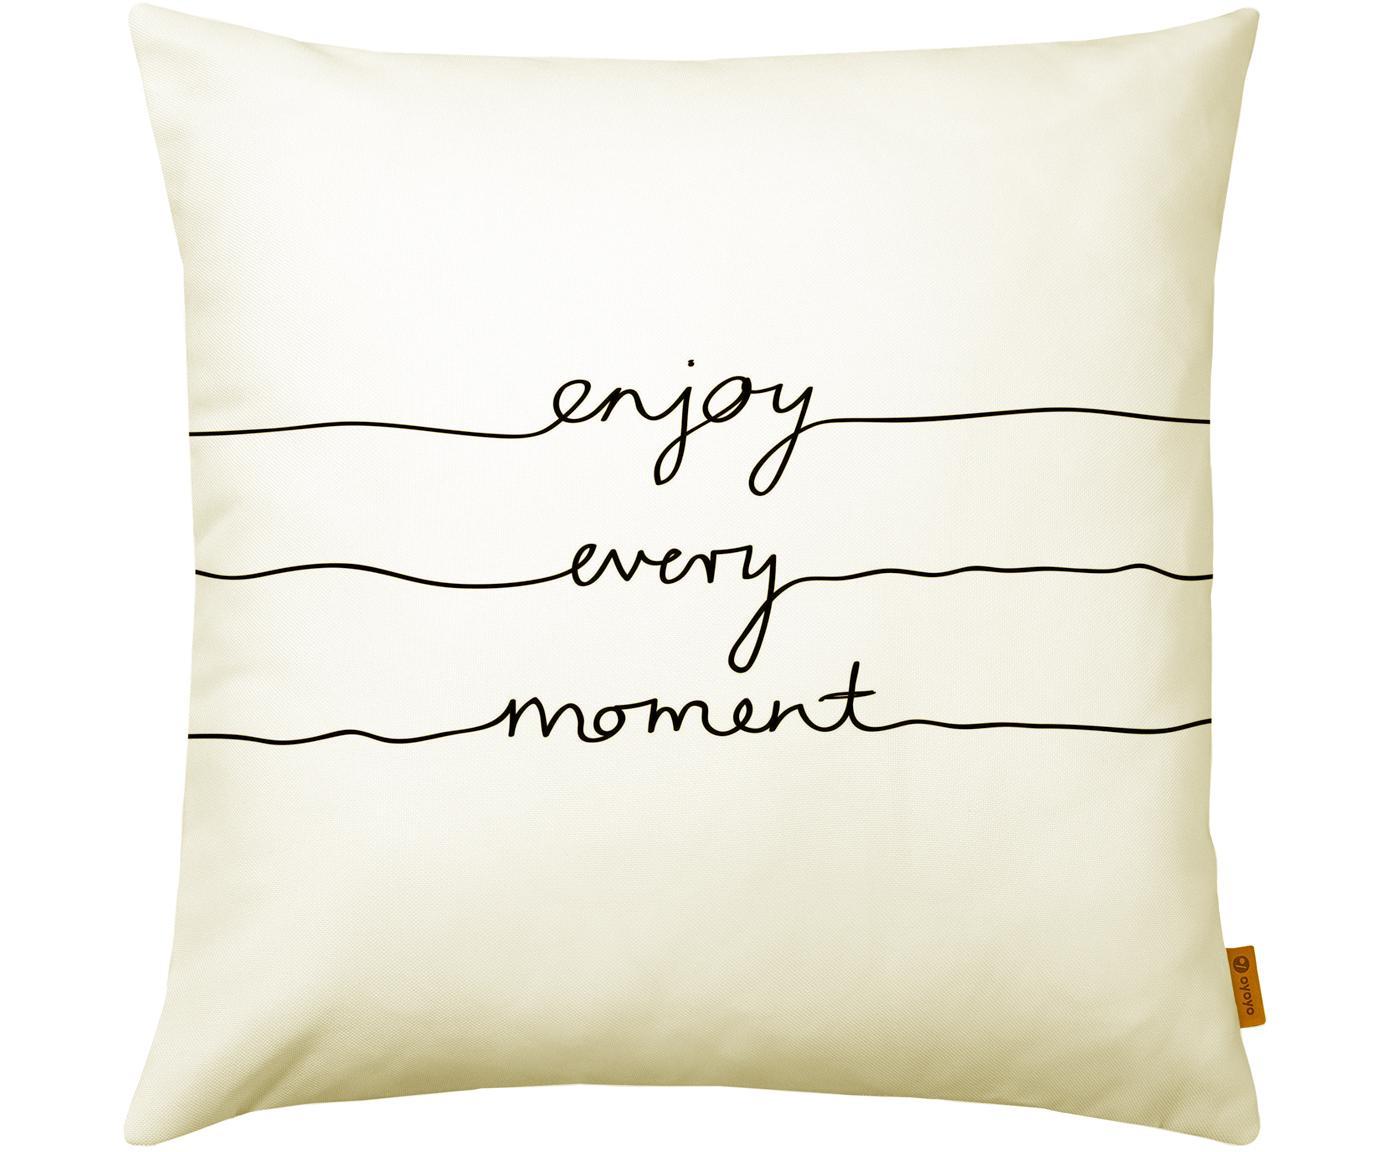 Kussenhoes Enjoy Every Moment met opschrift in zwart/wit, Polyester, Wit, zwart, 40 x 40 cm